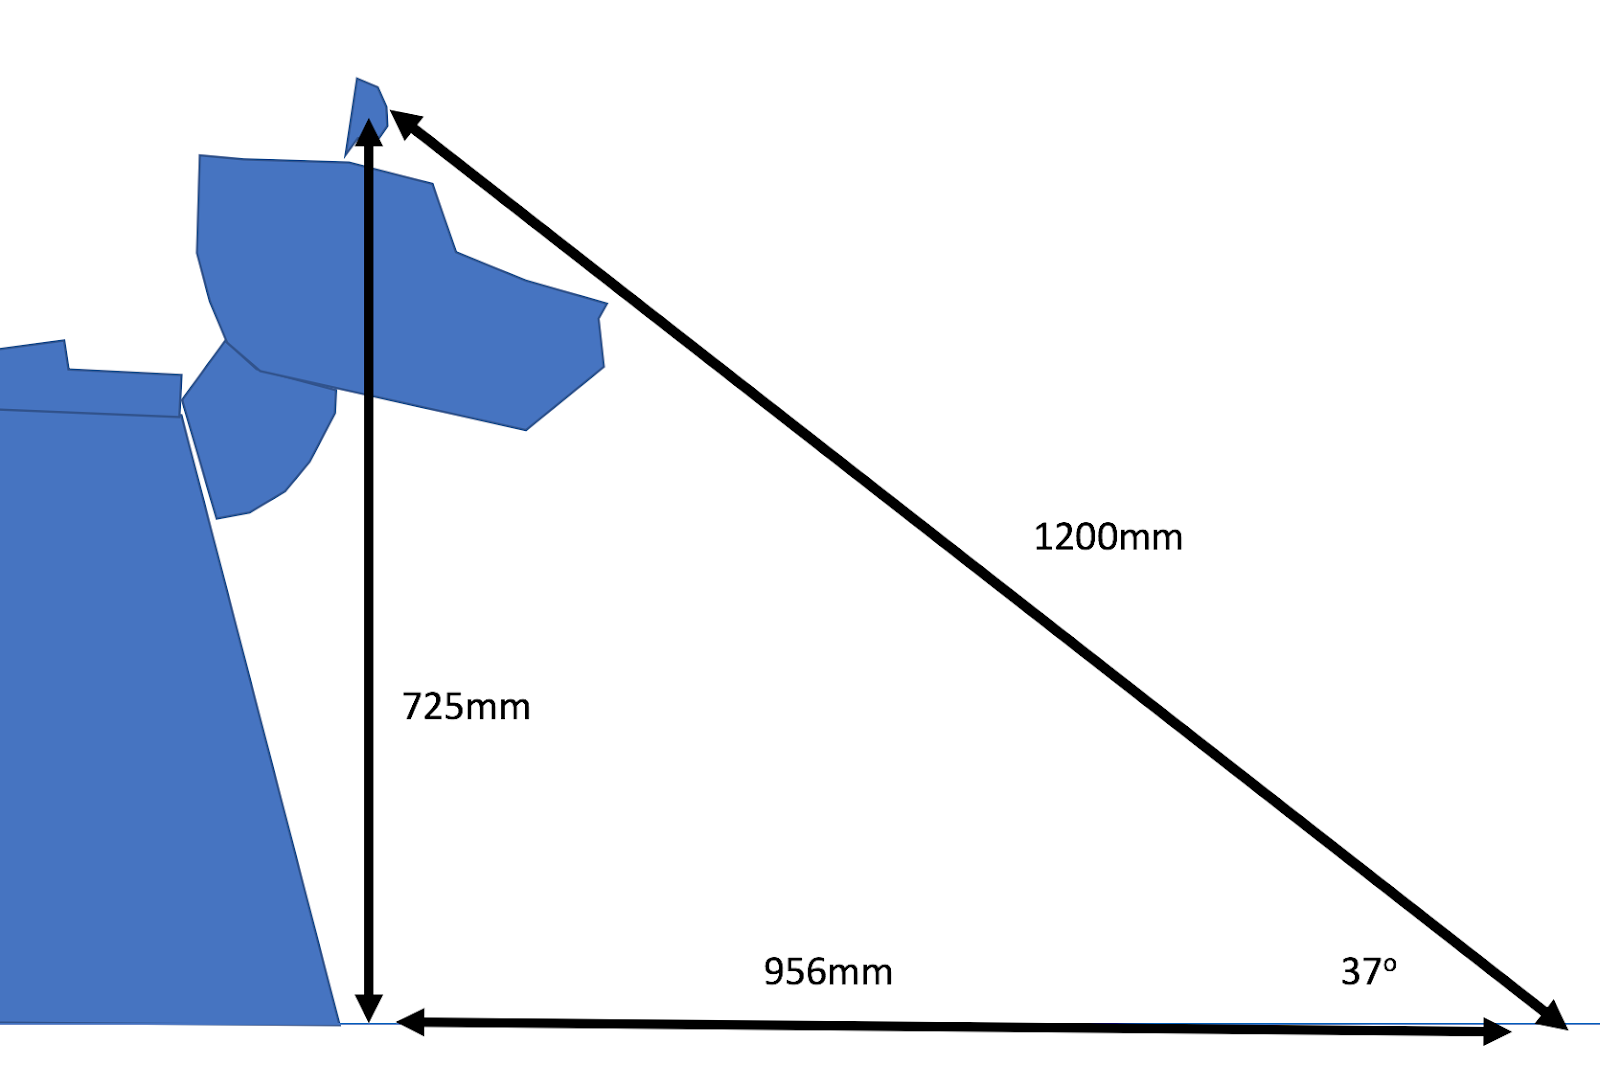 LIDAR ears for collision avoidance | Old dog, new tricks